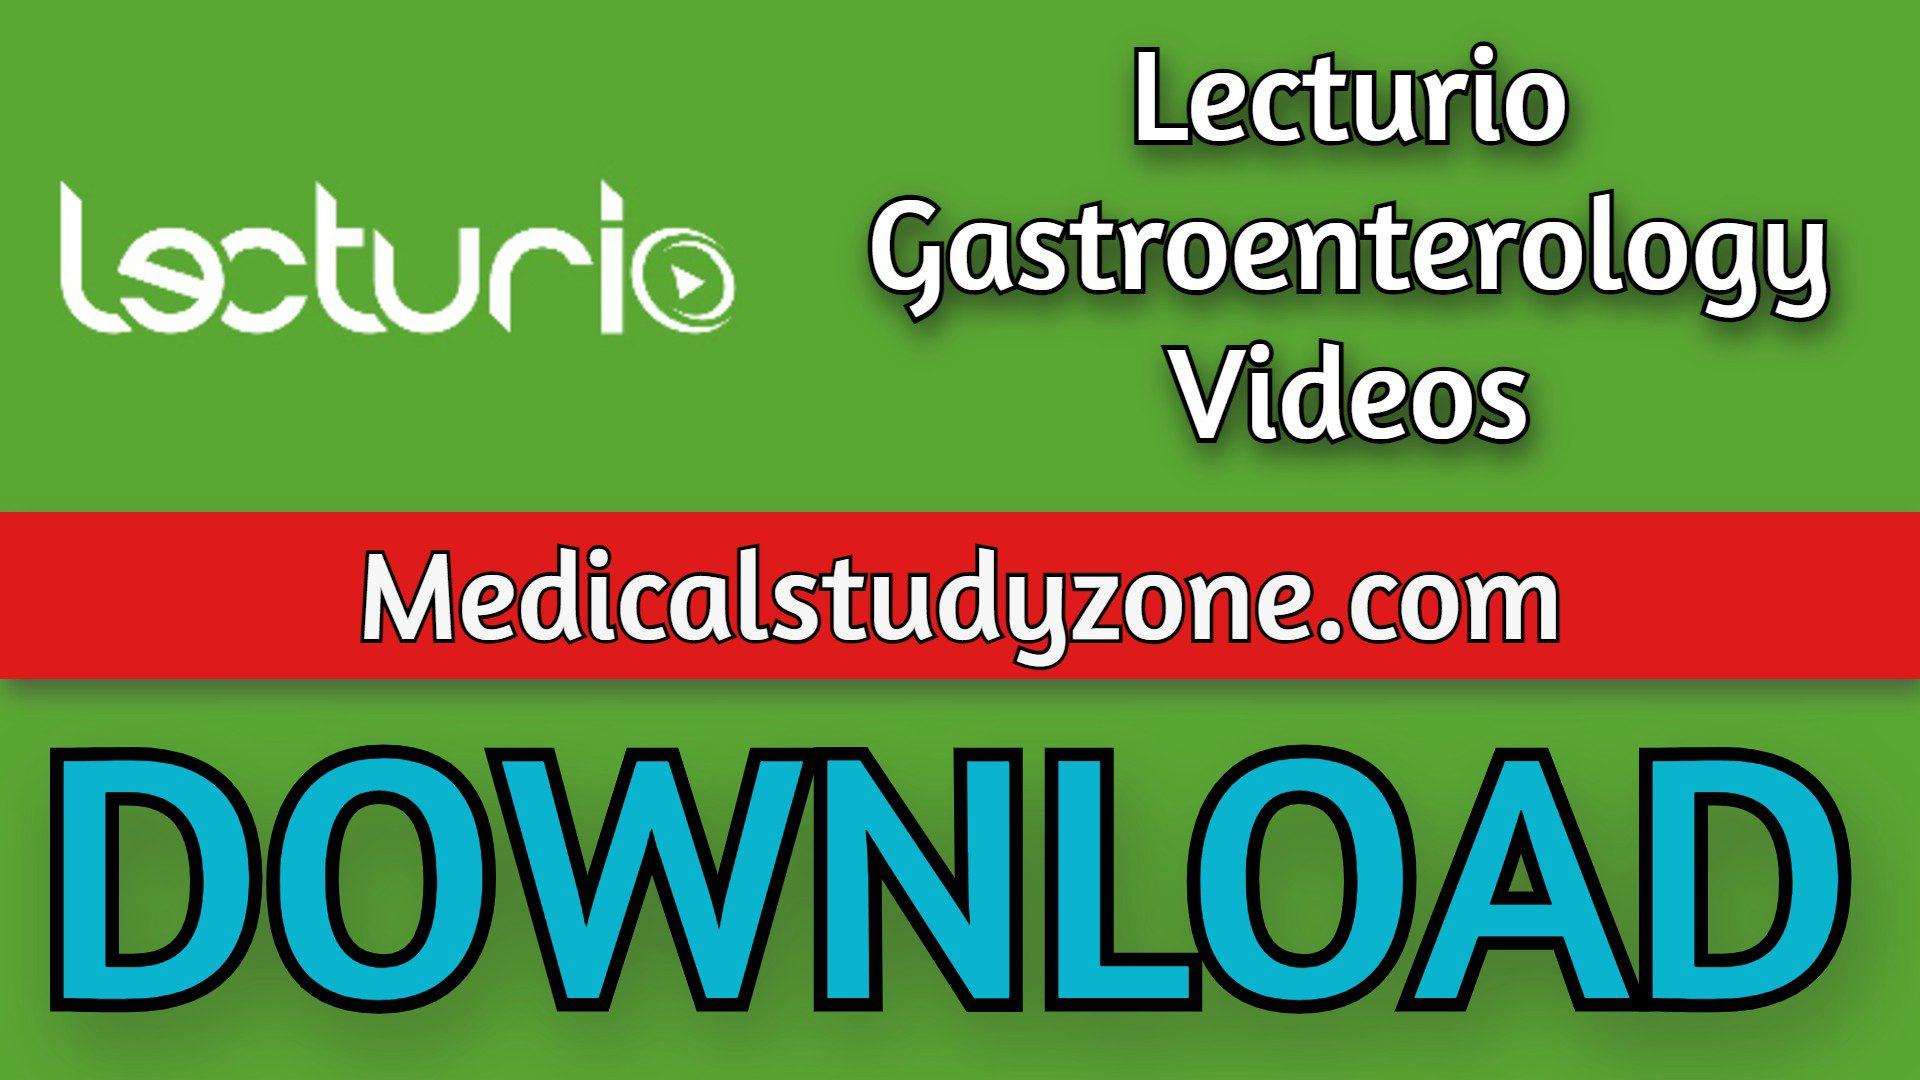 Lecturio Gastroenterology Videos 2021 Free Download